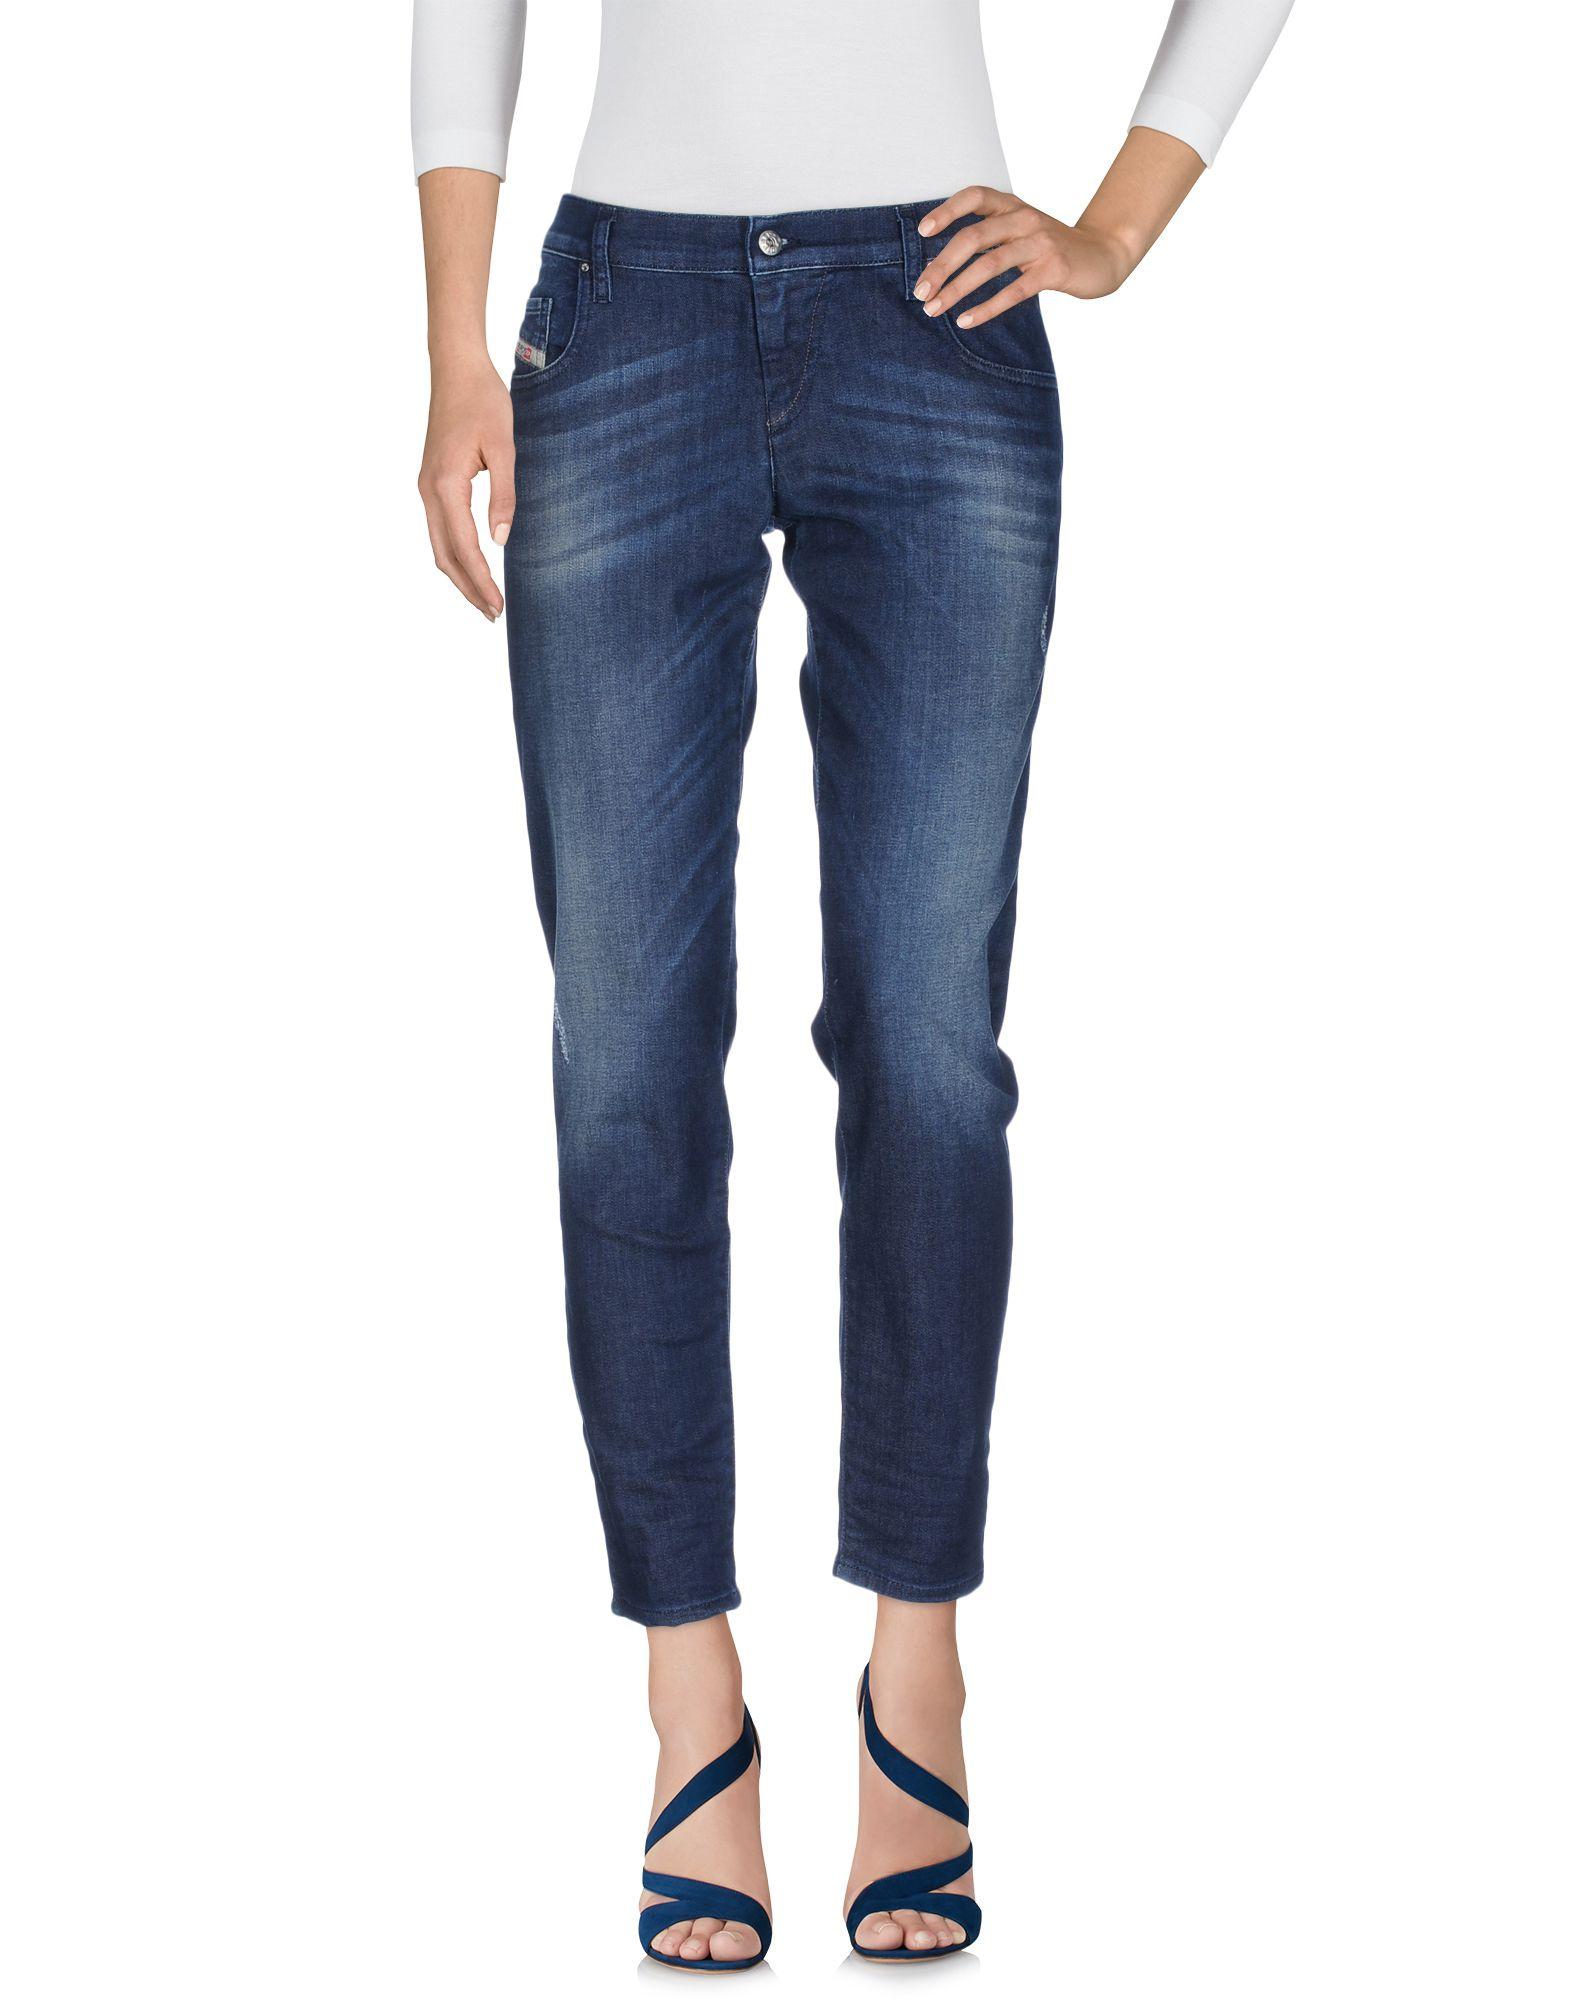 DIESEL Damen Jeanshose Farbe Blau Größe 8